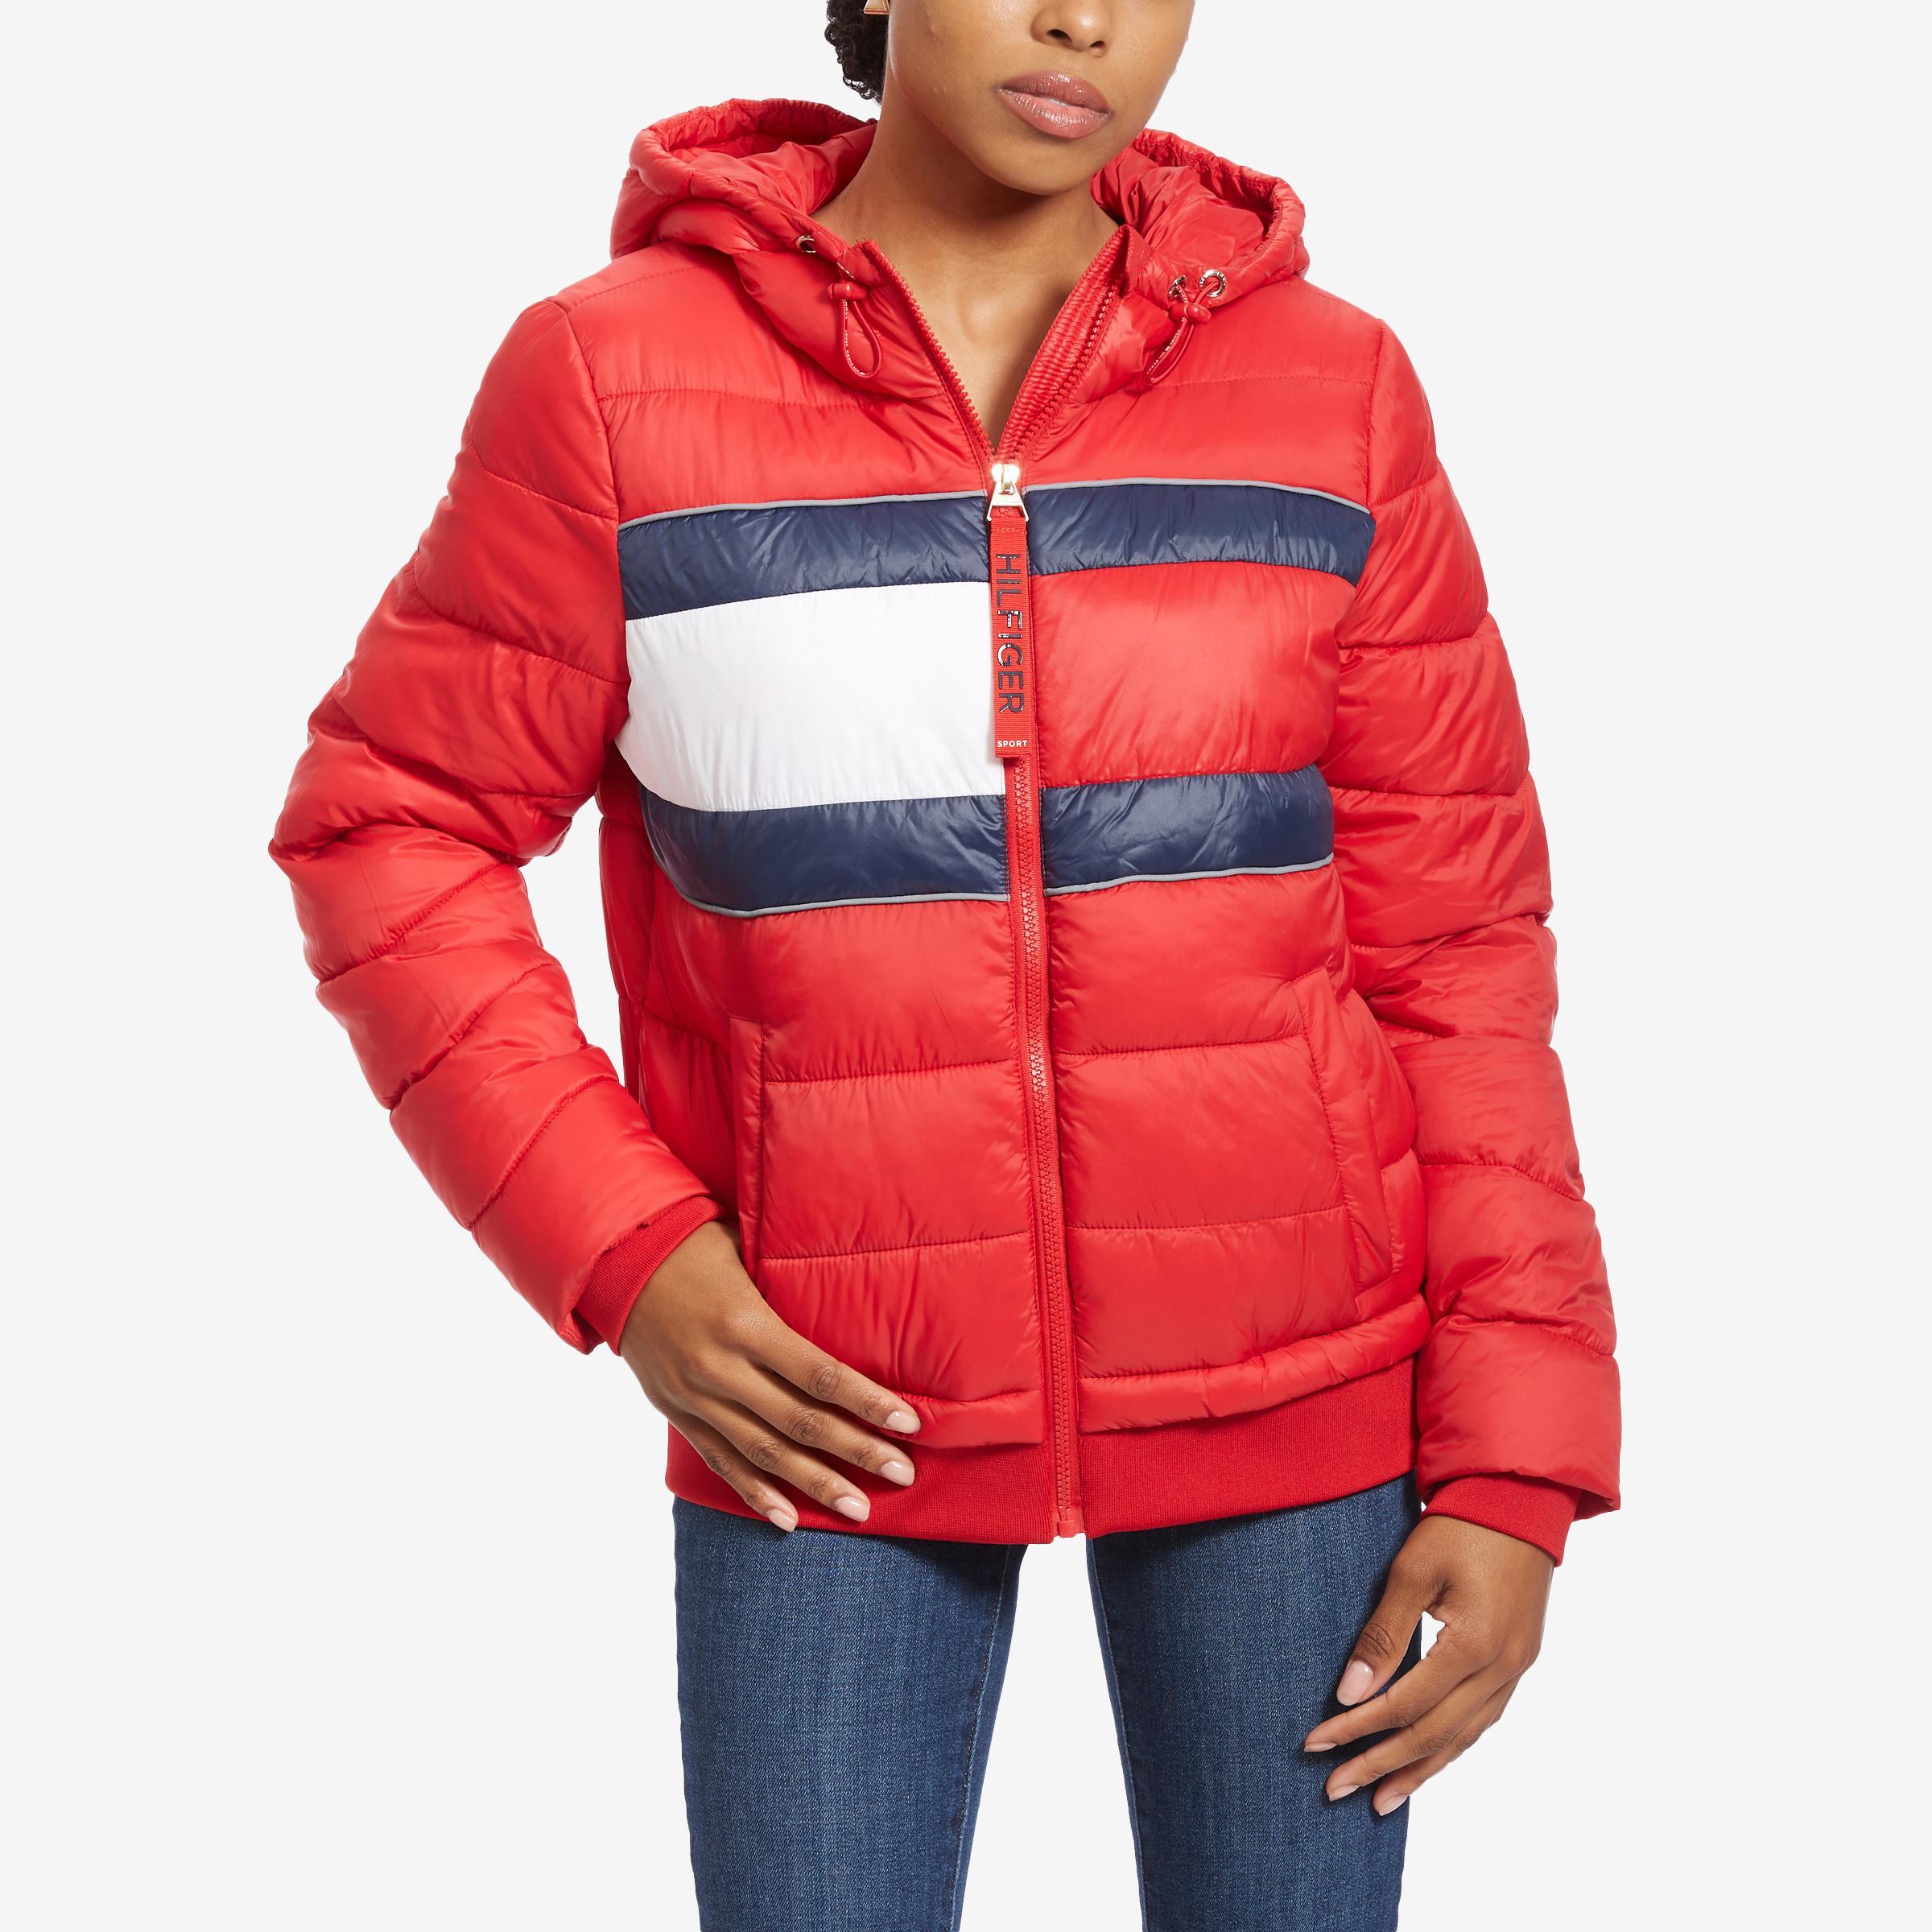 Women's Sport Quilted Colorblock Jacket